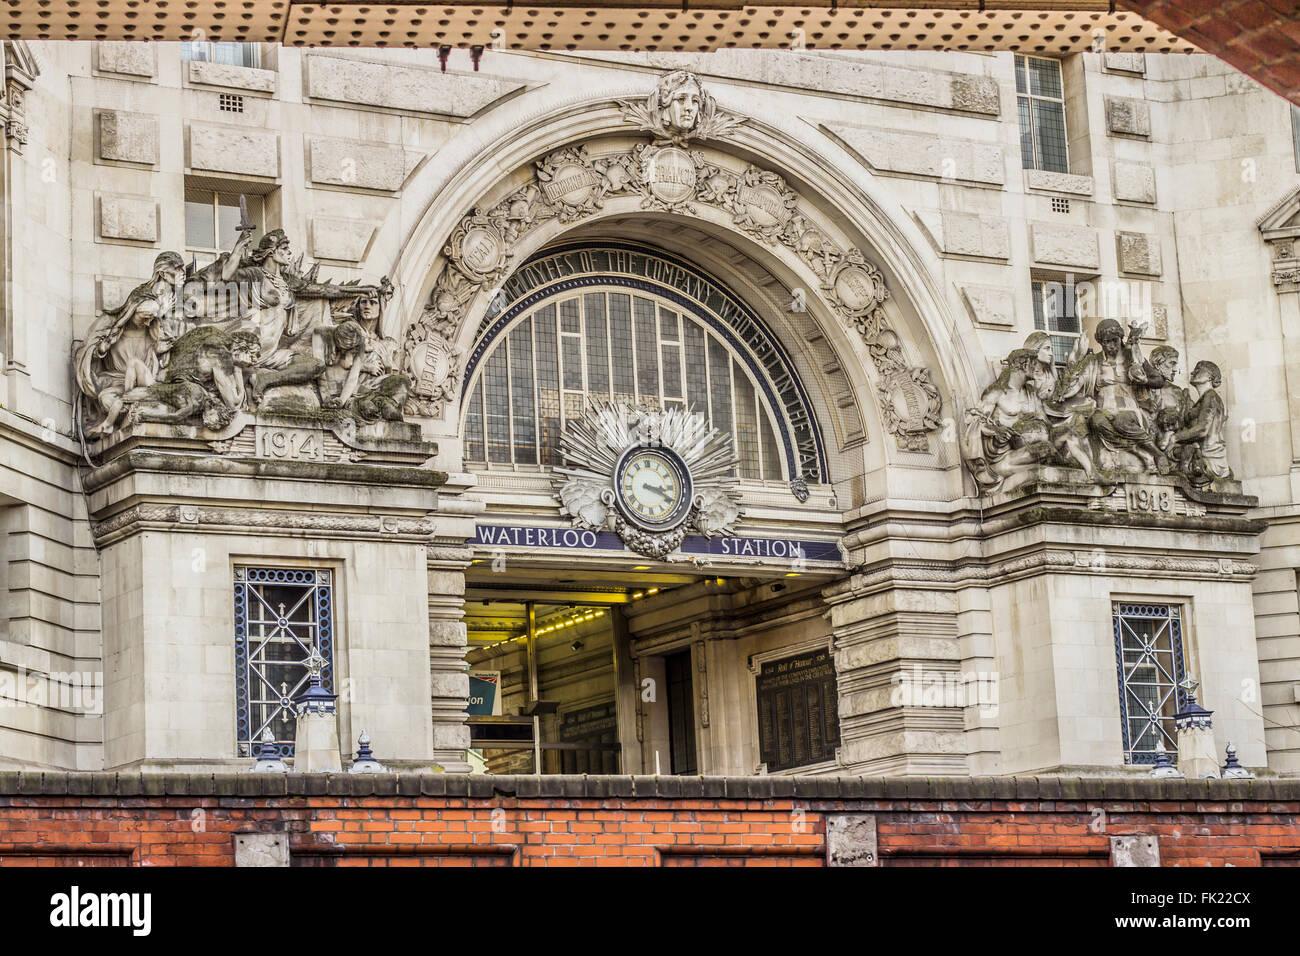 Waterloo station in London - Stock Image